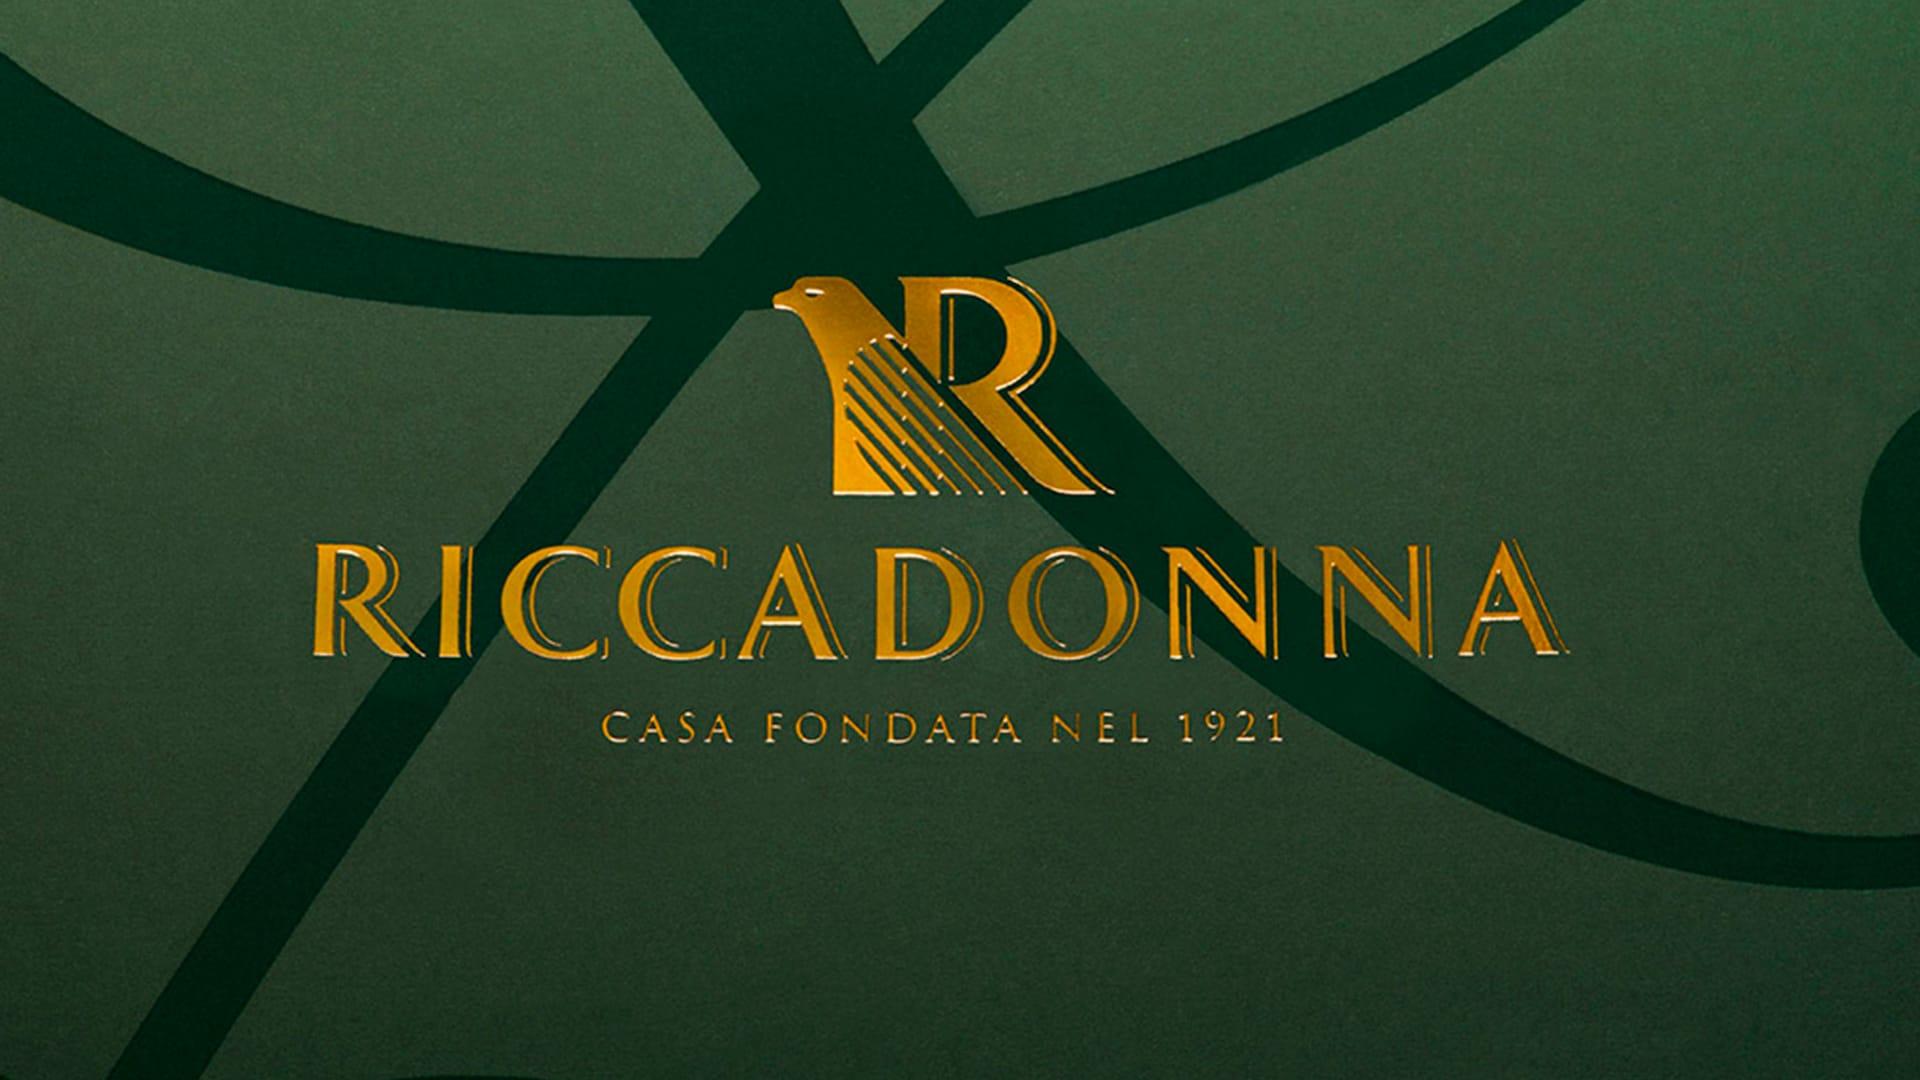 Riccadonna brand